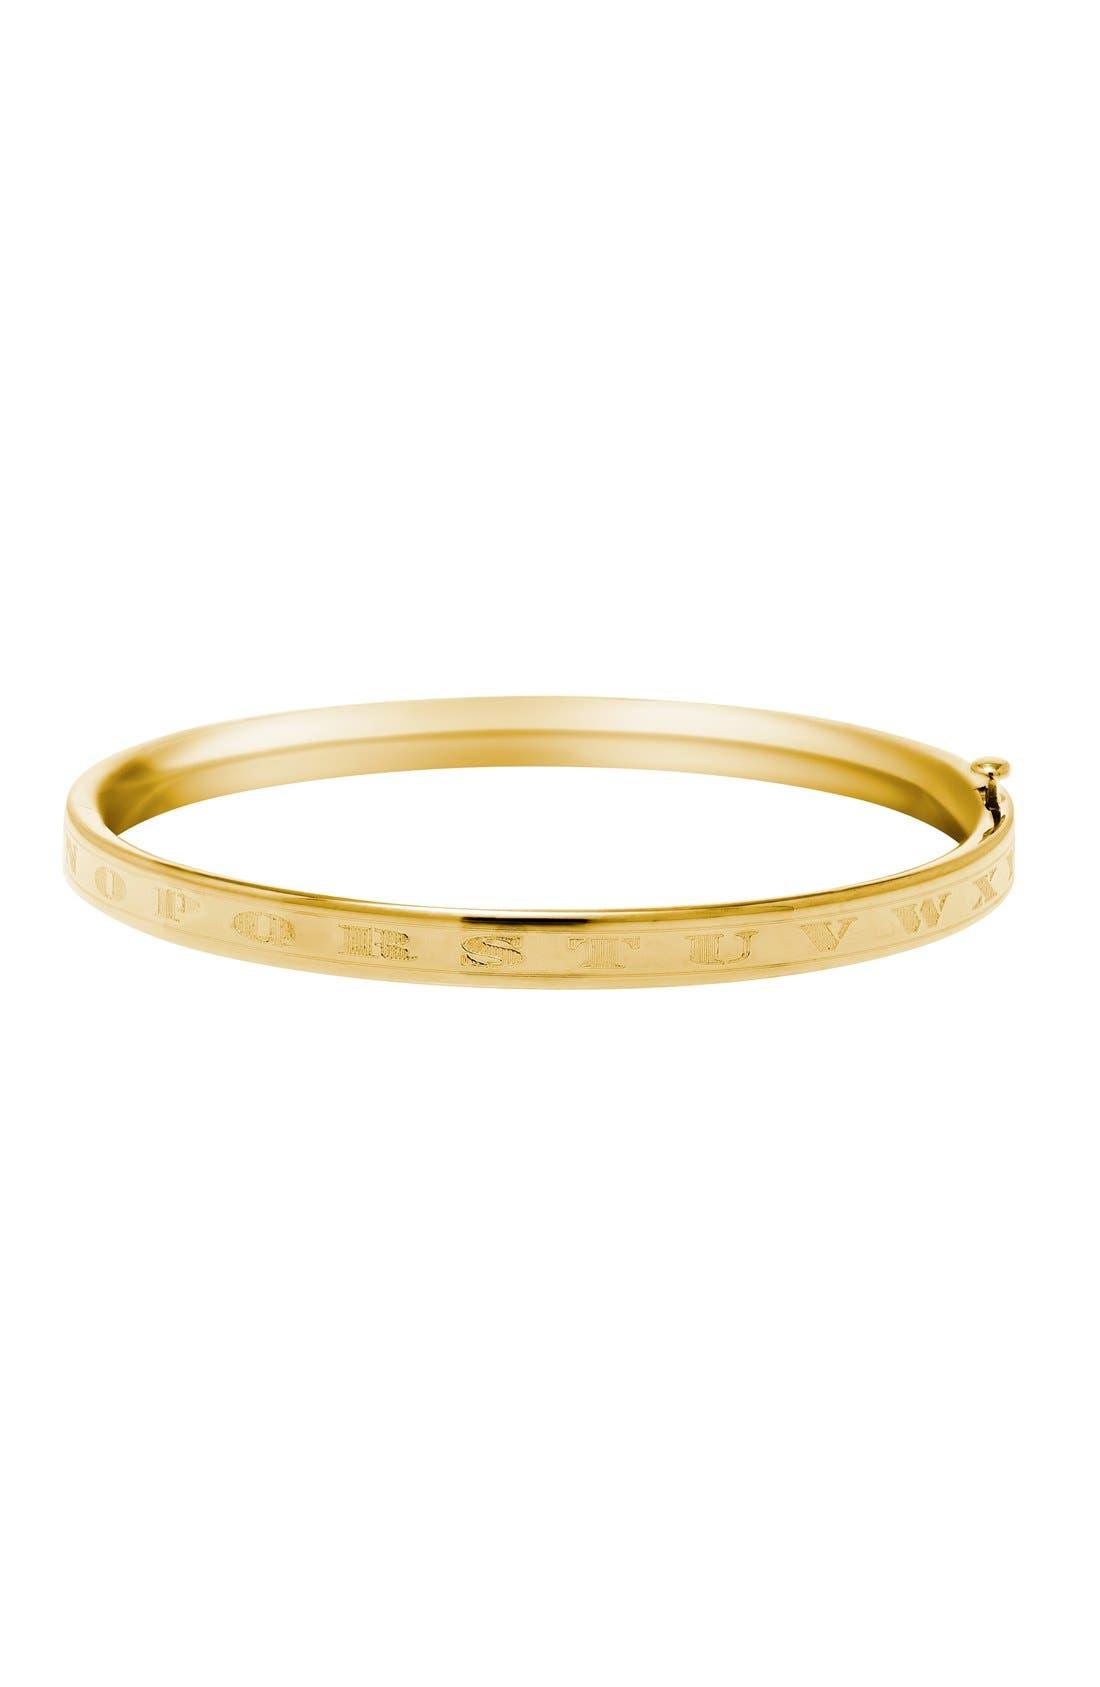 MIGNONETTE 'Alpha Baby' Gold Bracelet